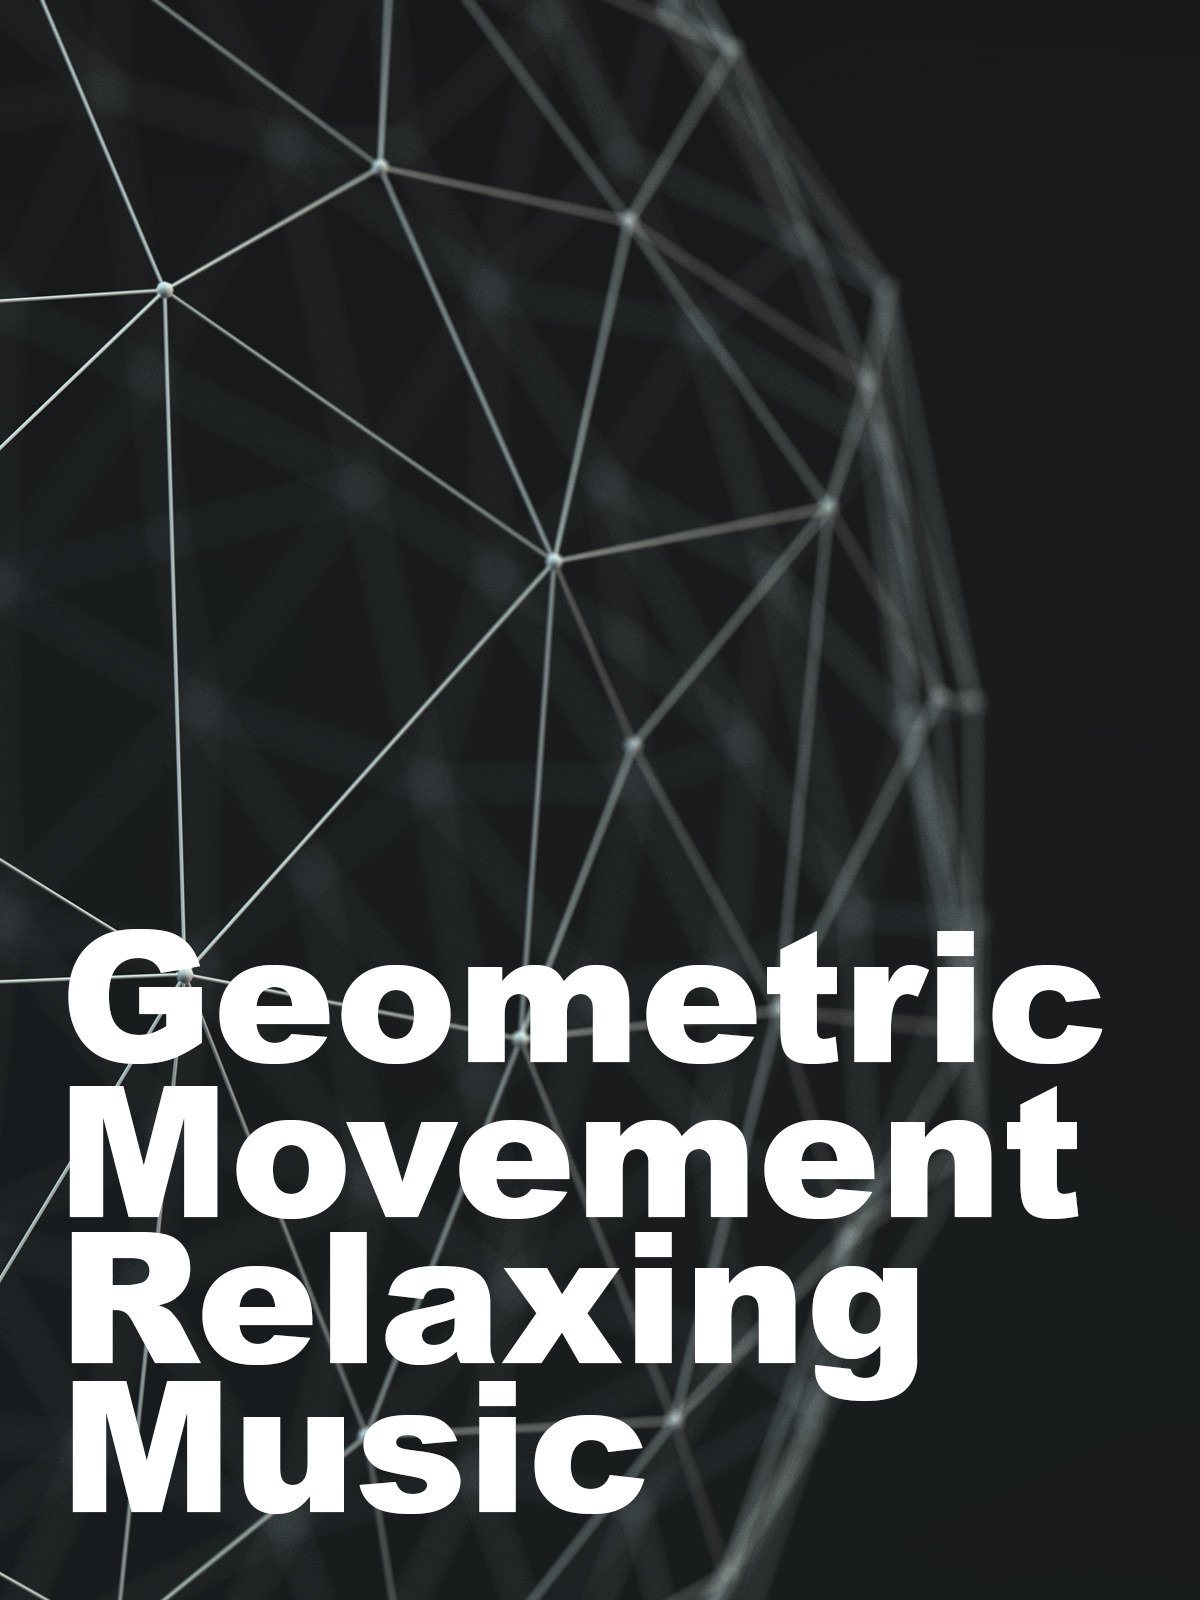 Geometric Movement Relaxing Music